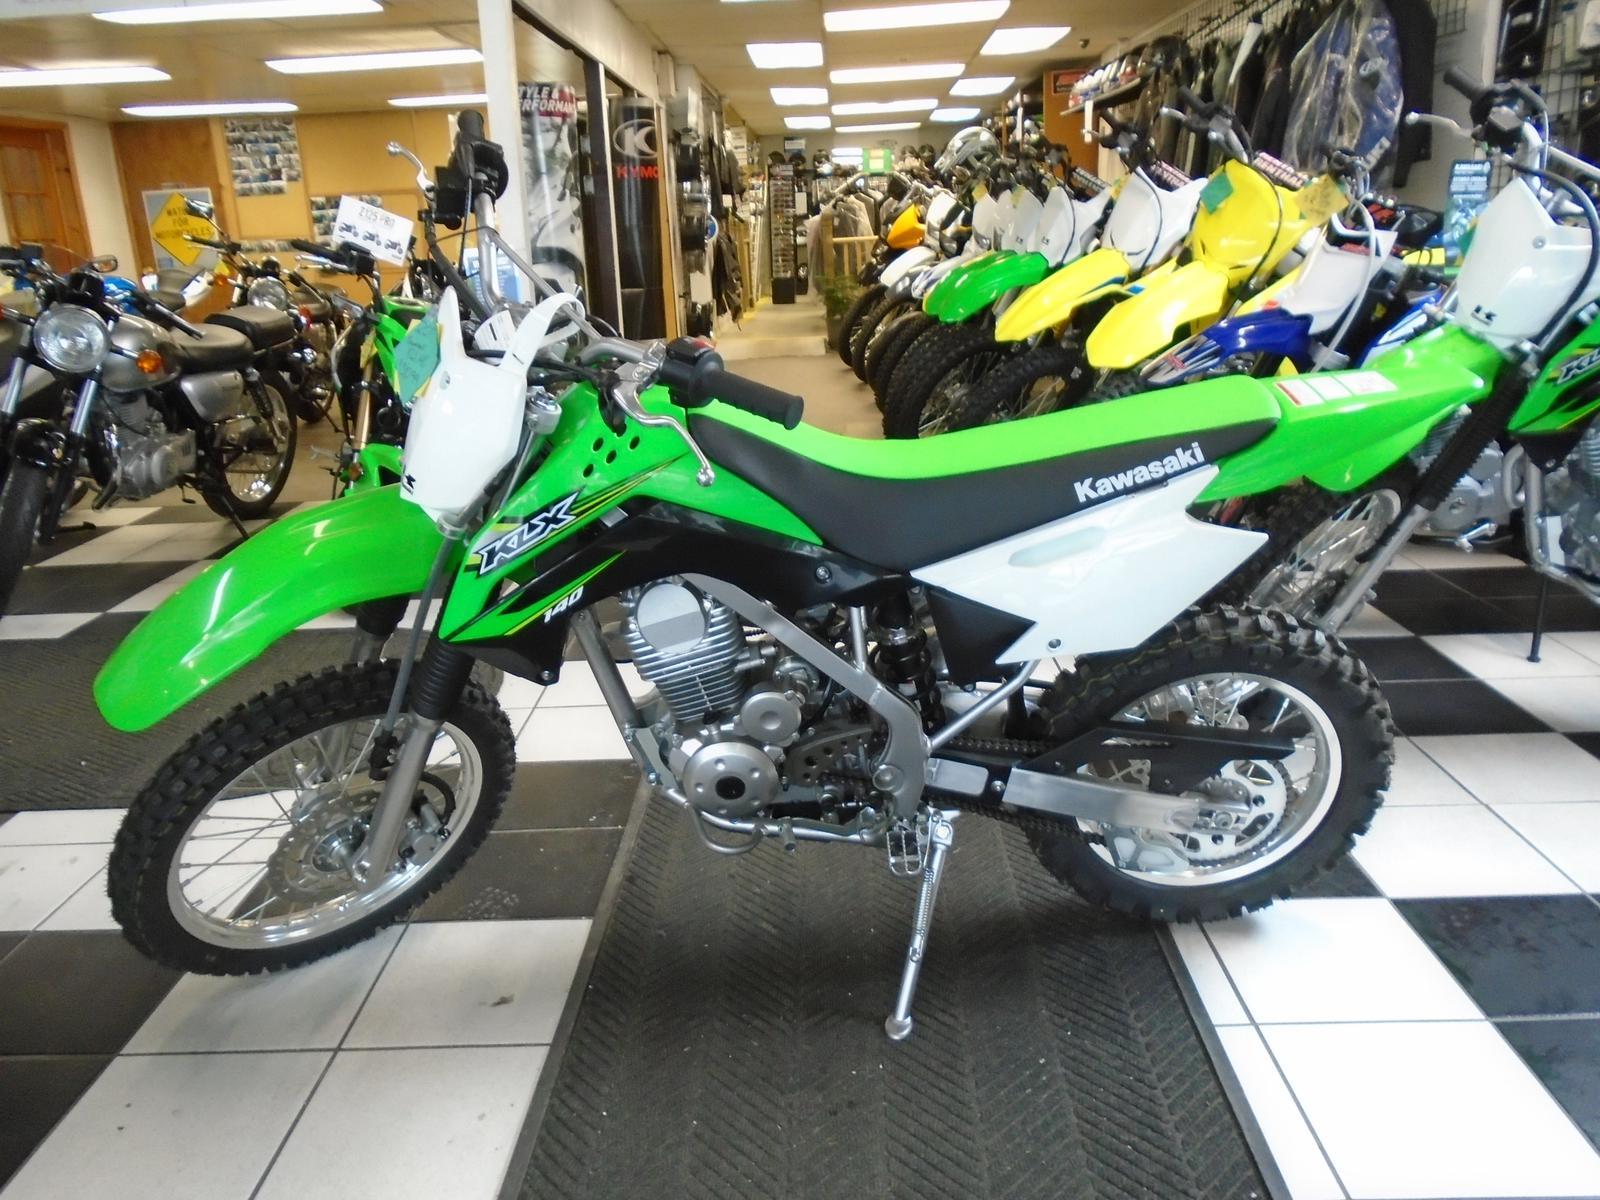 2017 Kawasaki KLX®140 for sale in Bridgeport, WV   Leeson's Import